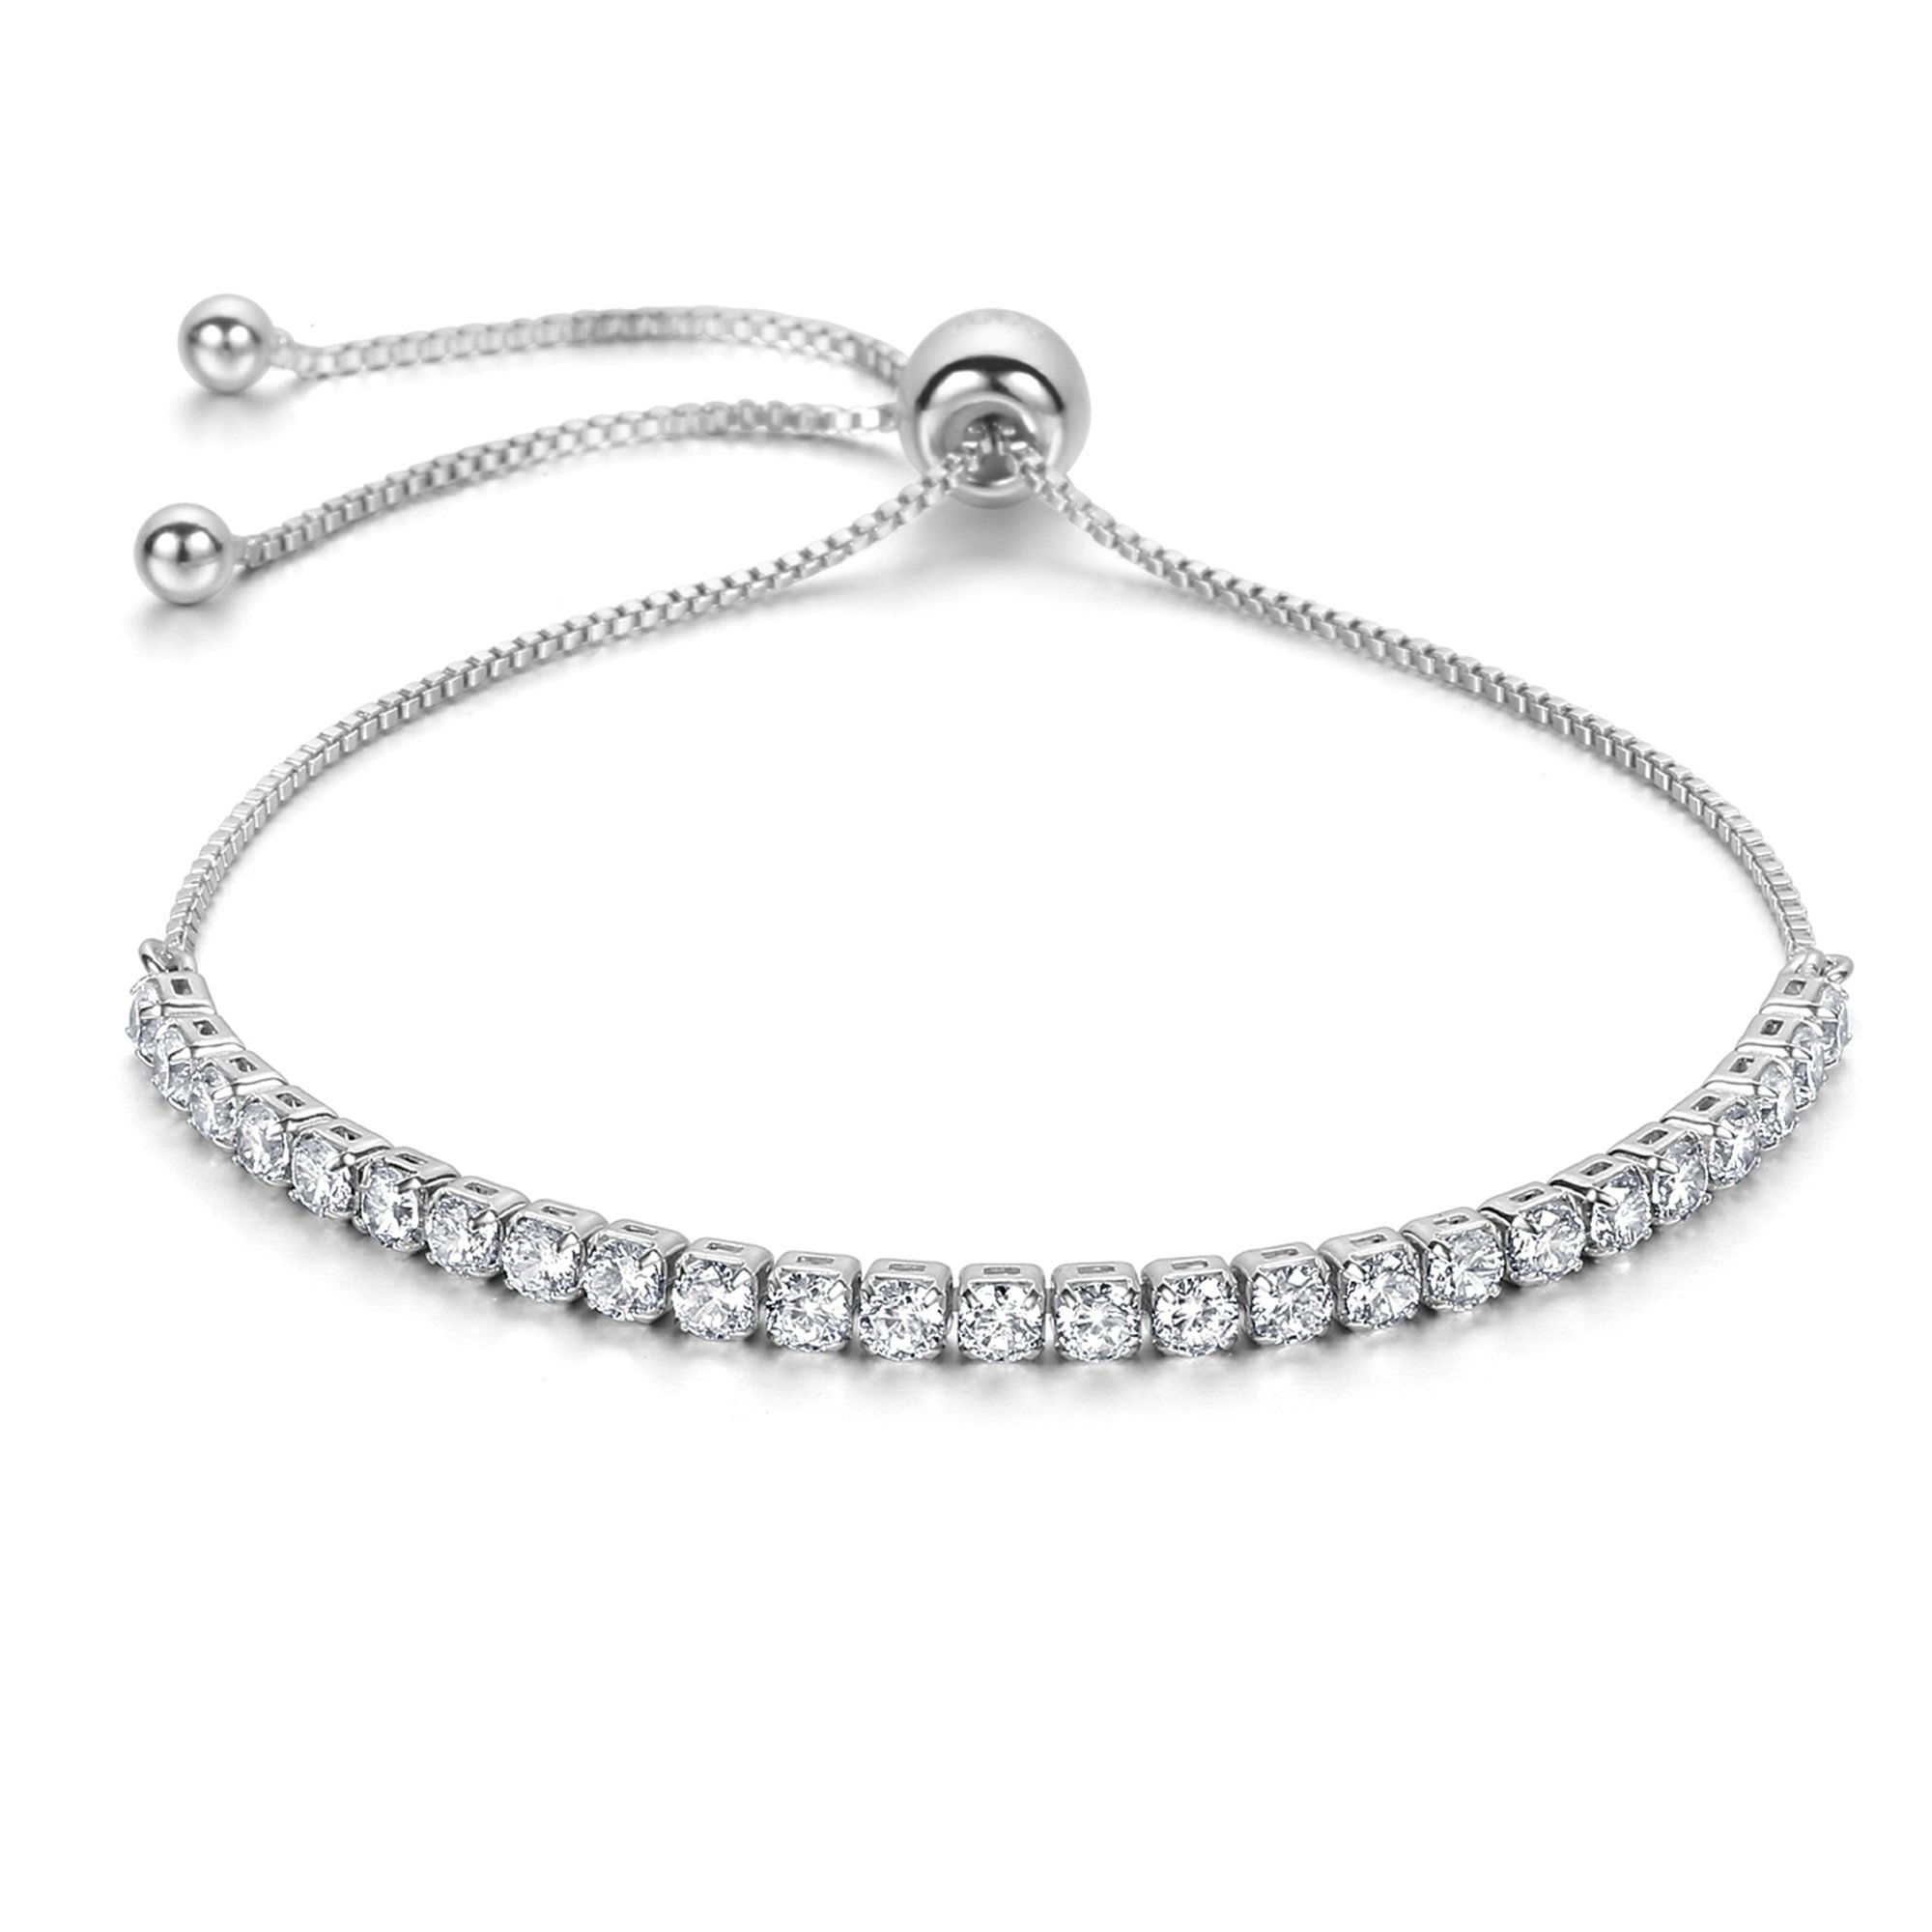 J.Fée Adjustable Bangle Bracelet Cubic Zirconia Diamond Silver Tone Bracelet for Women Christmas Birthday Gifts for Girls Wife Girlfriend Daughter for Sister Mom Her Link Bracelet